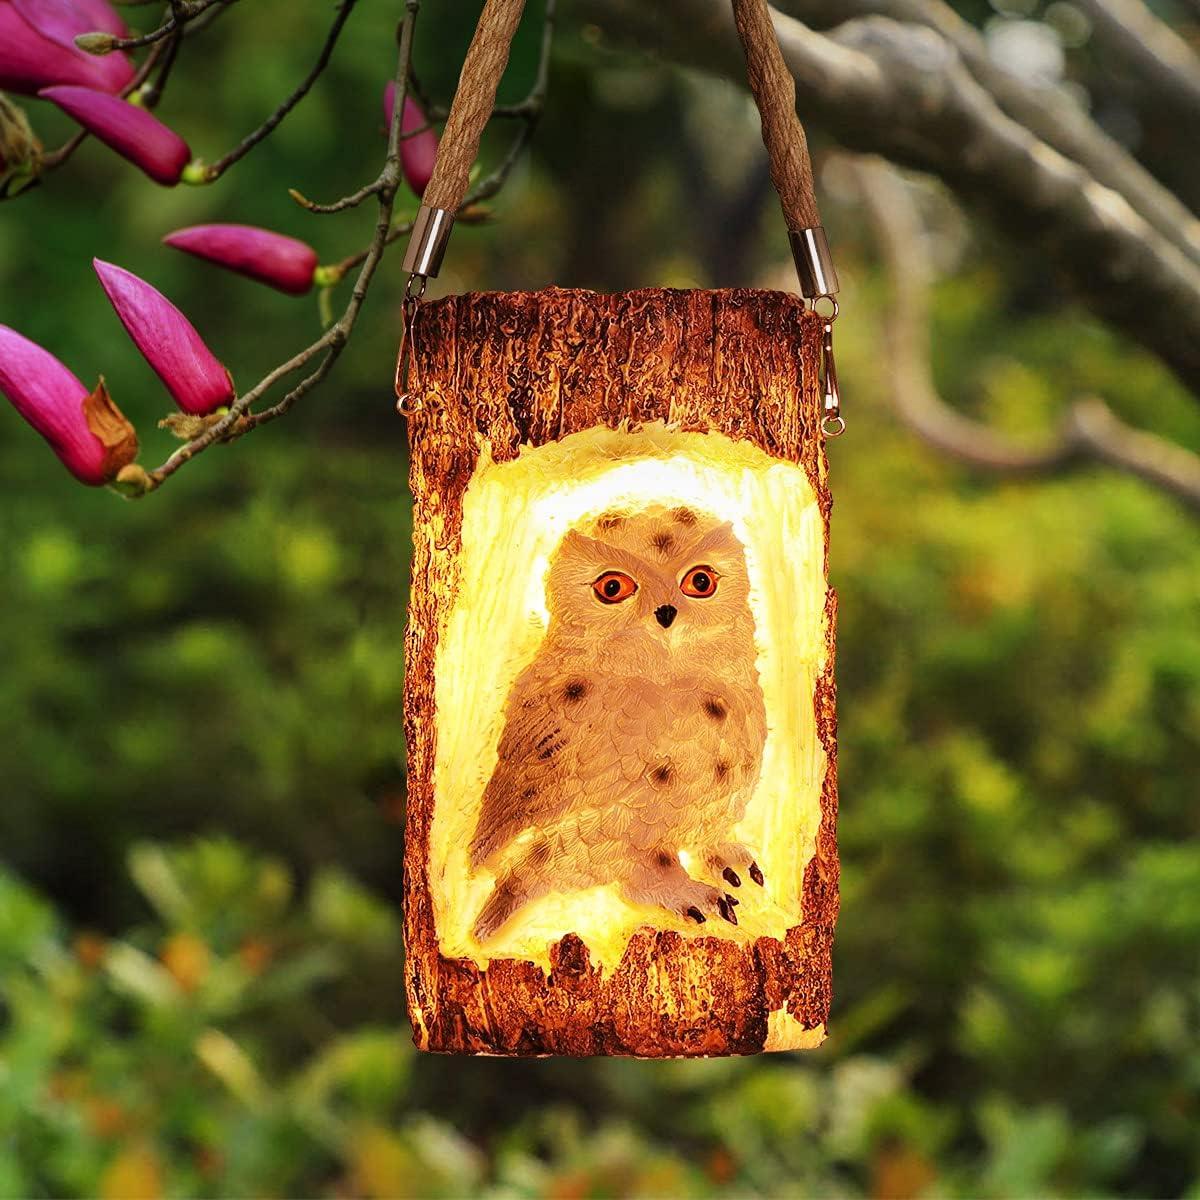 Solar Lights Outdoor Decorative, BUCASA Owl Solar Garden Lights Hanging Solar Lantern, Waterproof, Auto On/Off, Bright Solar Powered Outdoor Lights for Patio Yard Landscape Garden Decor